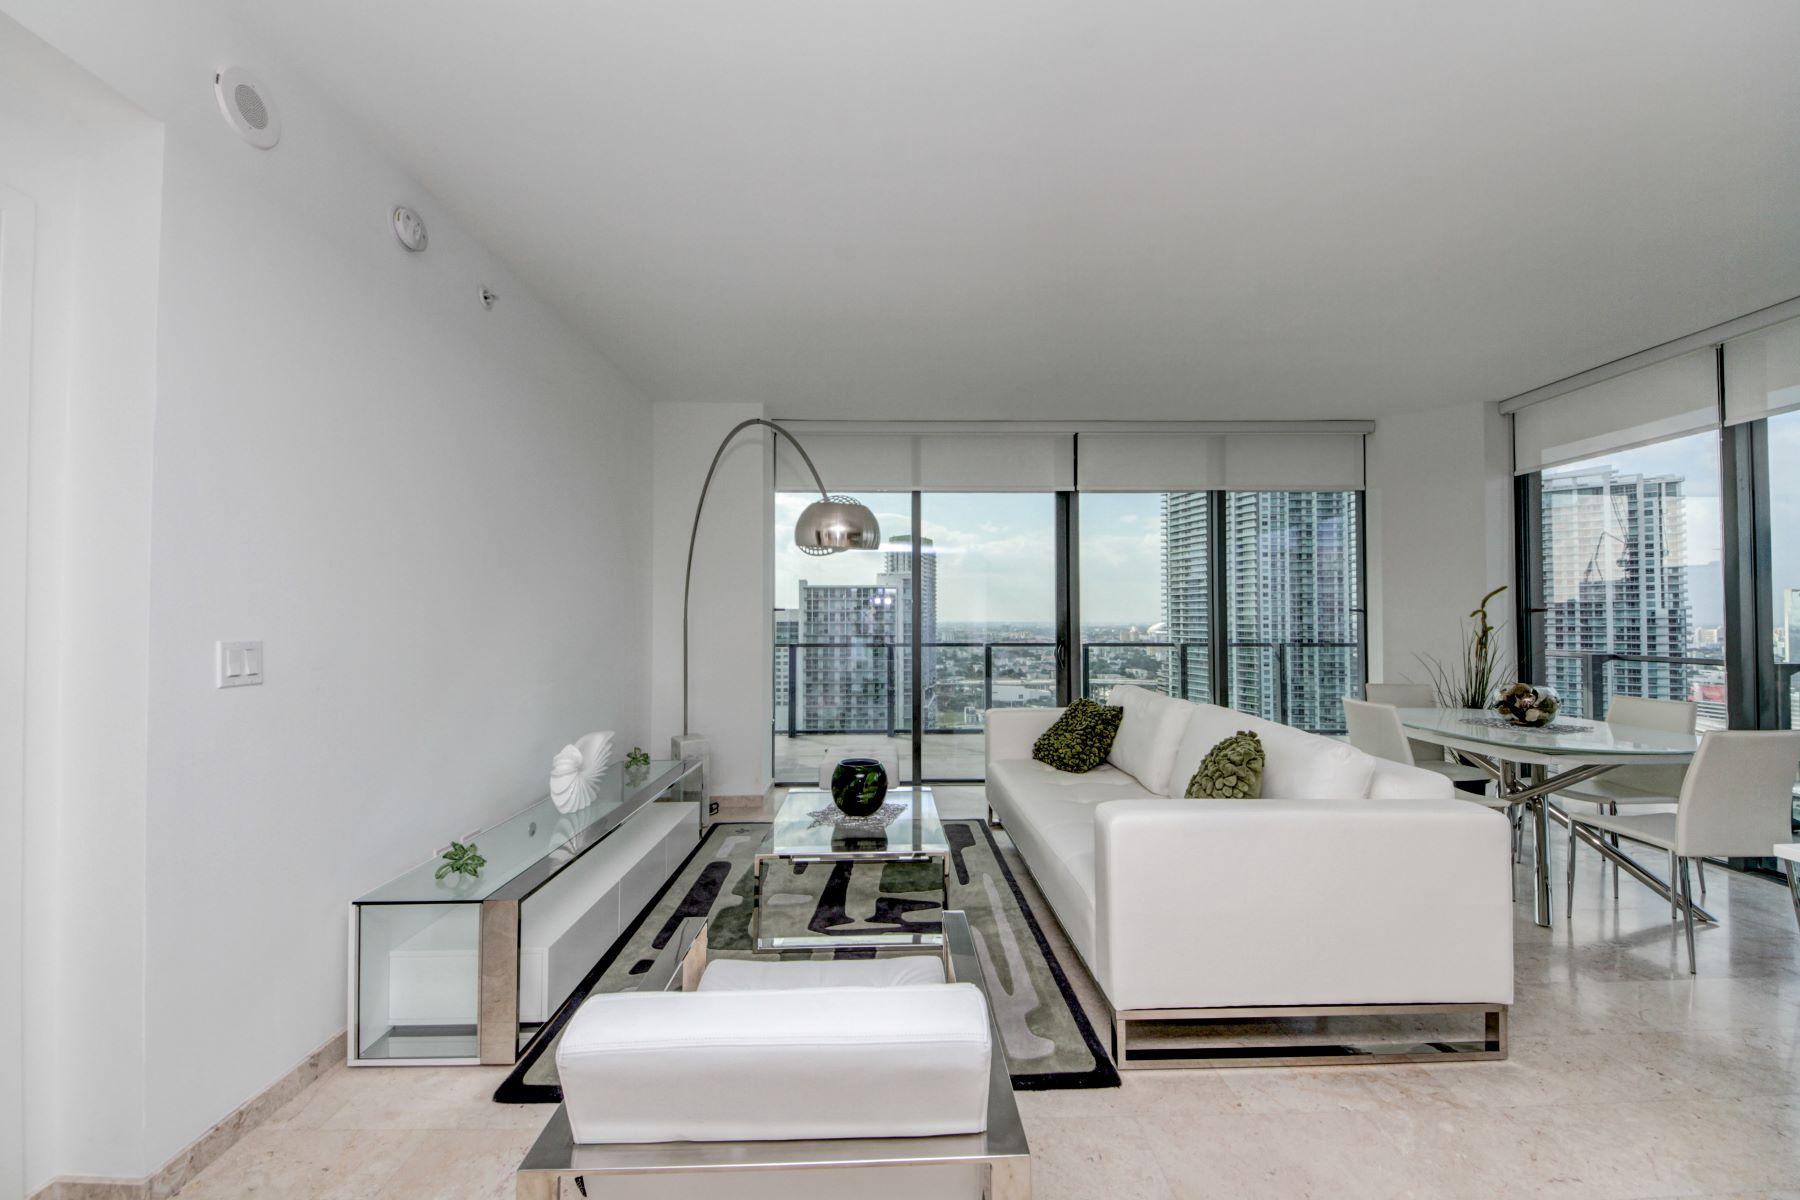 Condominium for Sale at 68 Se 6th St 68 Se 6th St 2412 Miami, Florida 33131 United States